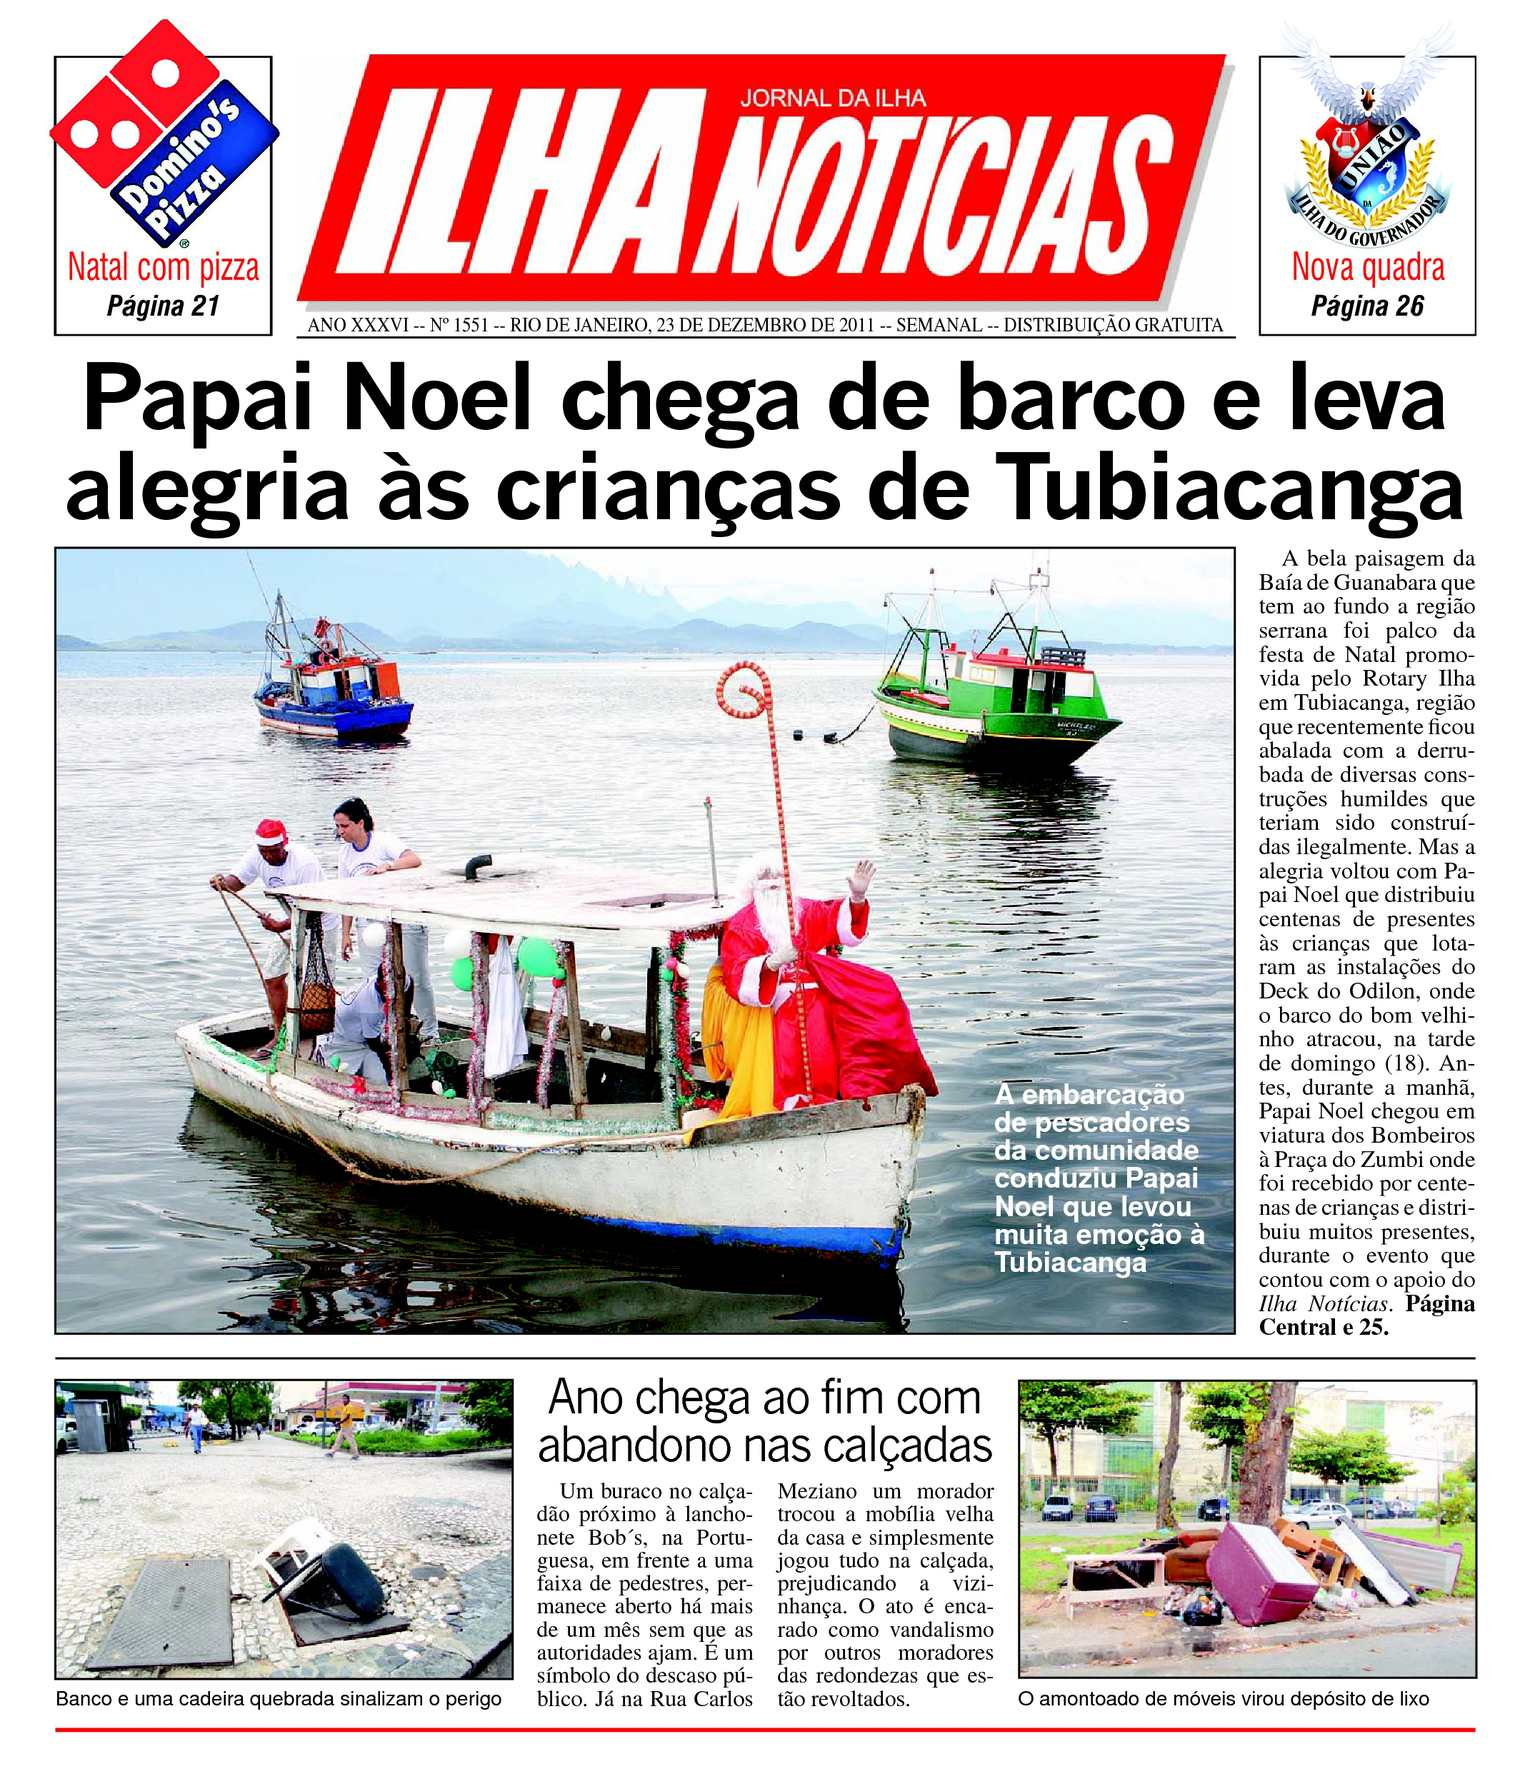 5b487eb03dd Calaméo - Jornal Ilha Notícias - Edição 1551 - 23 12 2011